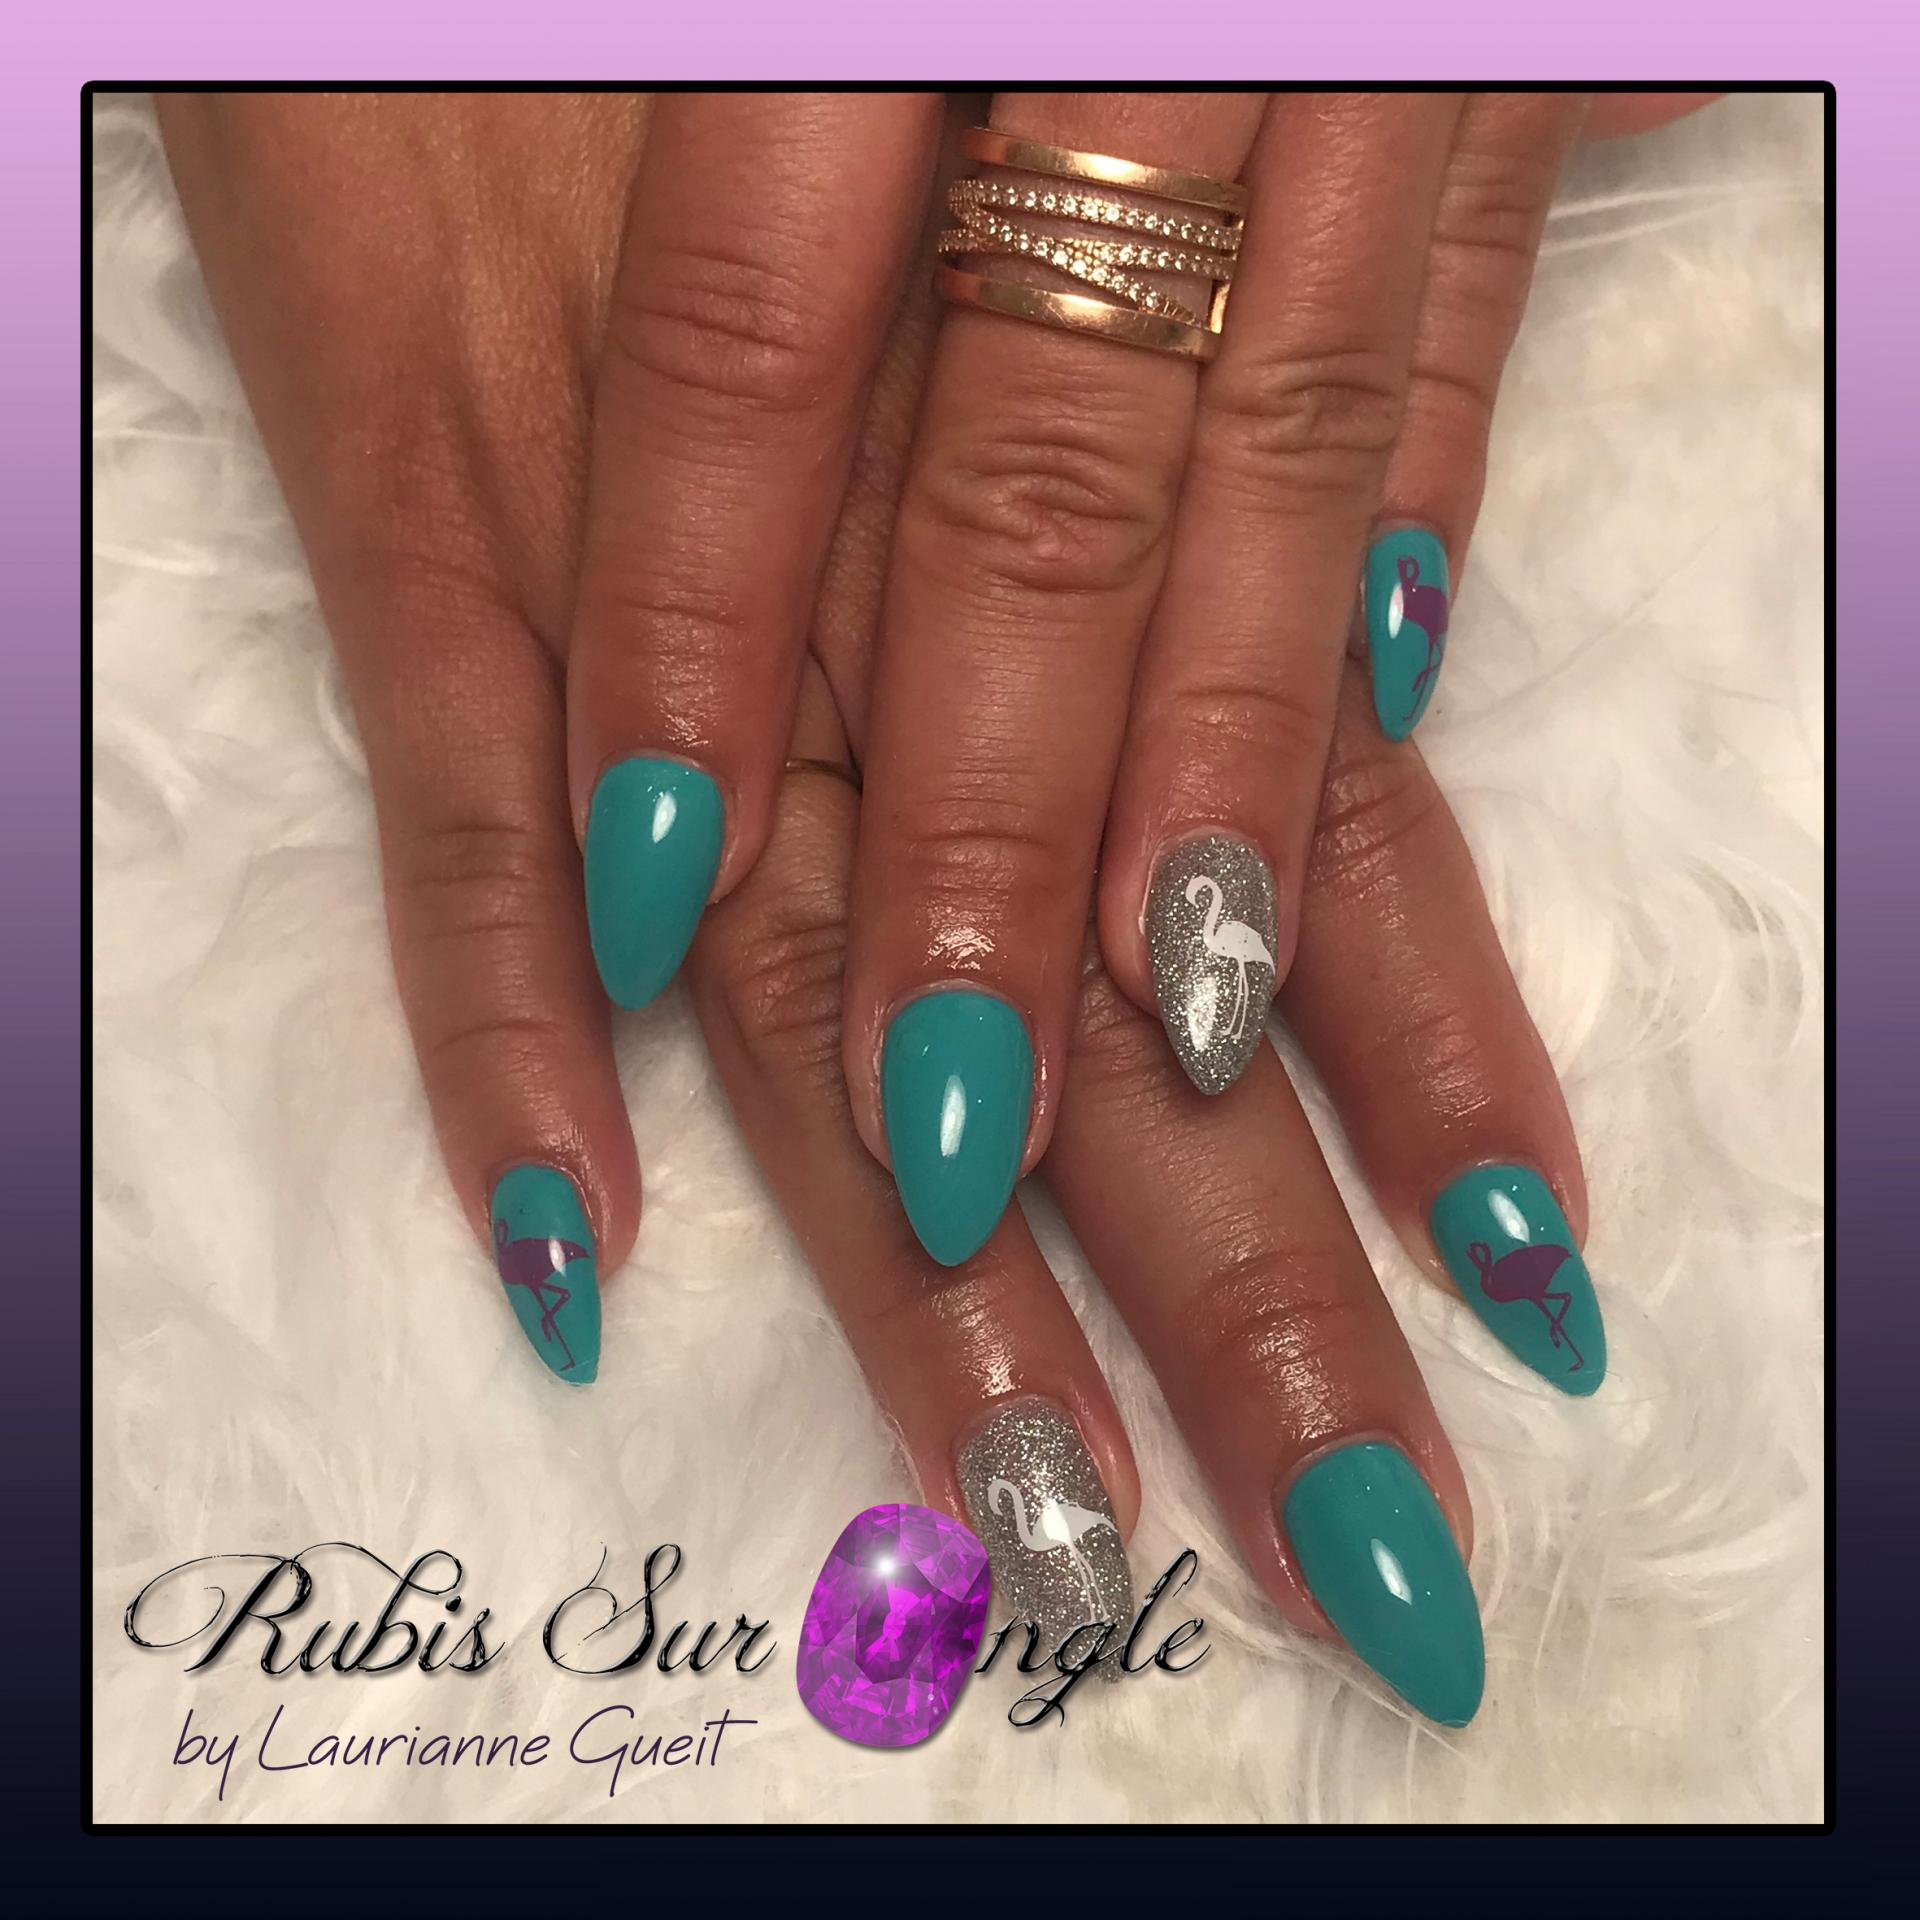 Rubis-Sur-Ongle-Nail-Art-Bleu-Vert-Flamand-Rose